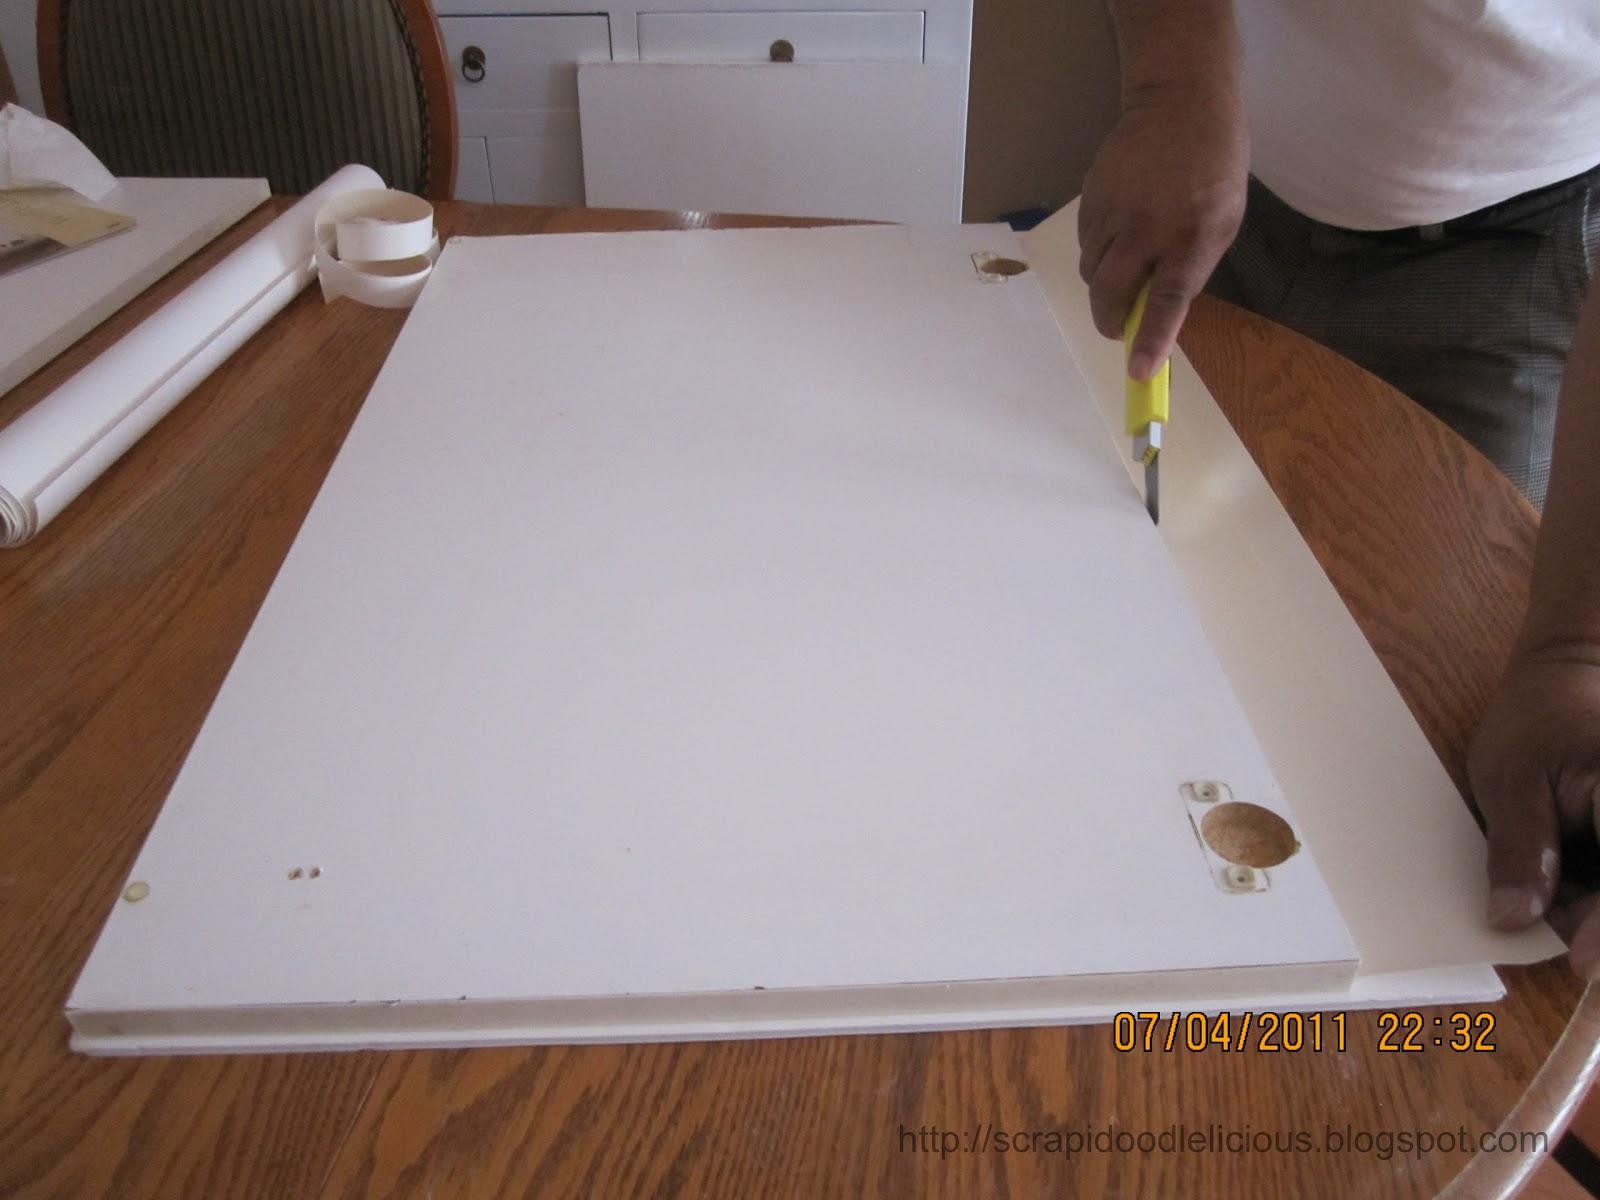 Putting wallpaper on cabinets wallpapersafari - Wallpaper on kitchen cabinet doors ...